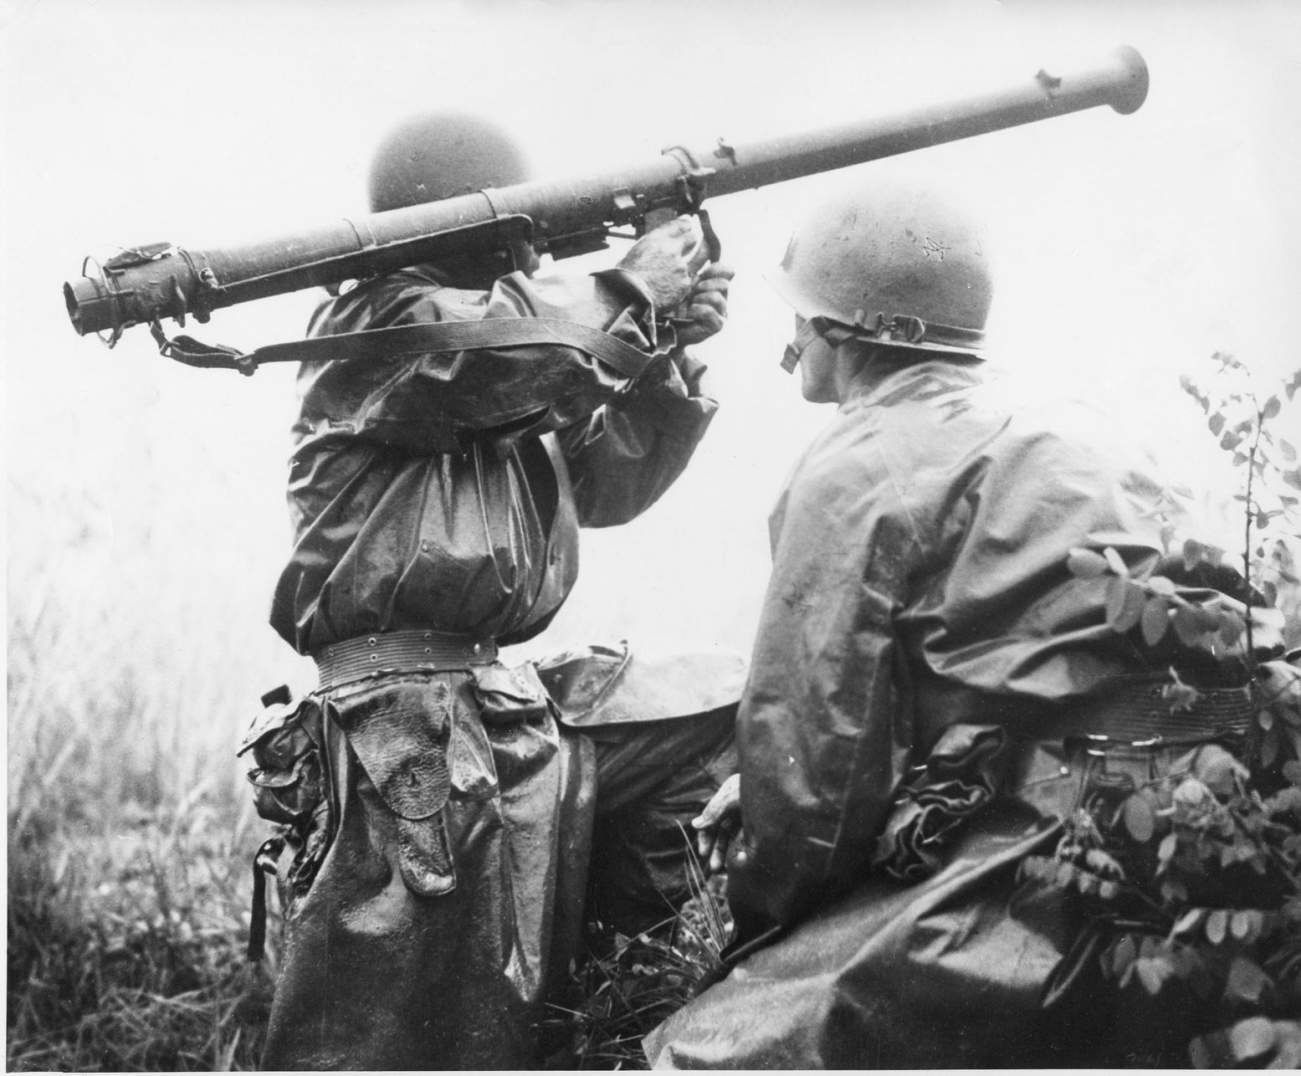 https://en.wikipedia.org/wiki/Battle_of_Osan#/media/File:Osan_Bazooka_Team.jpg